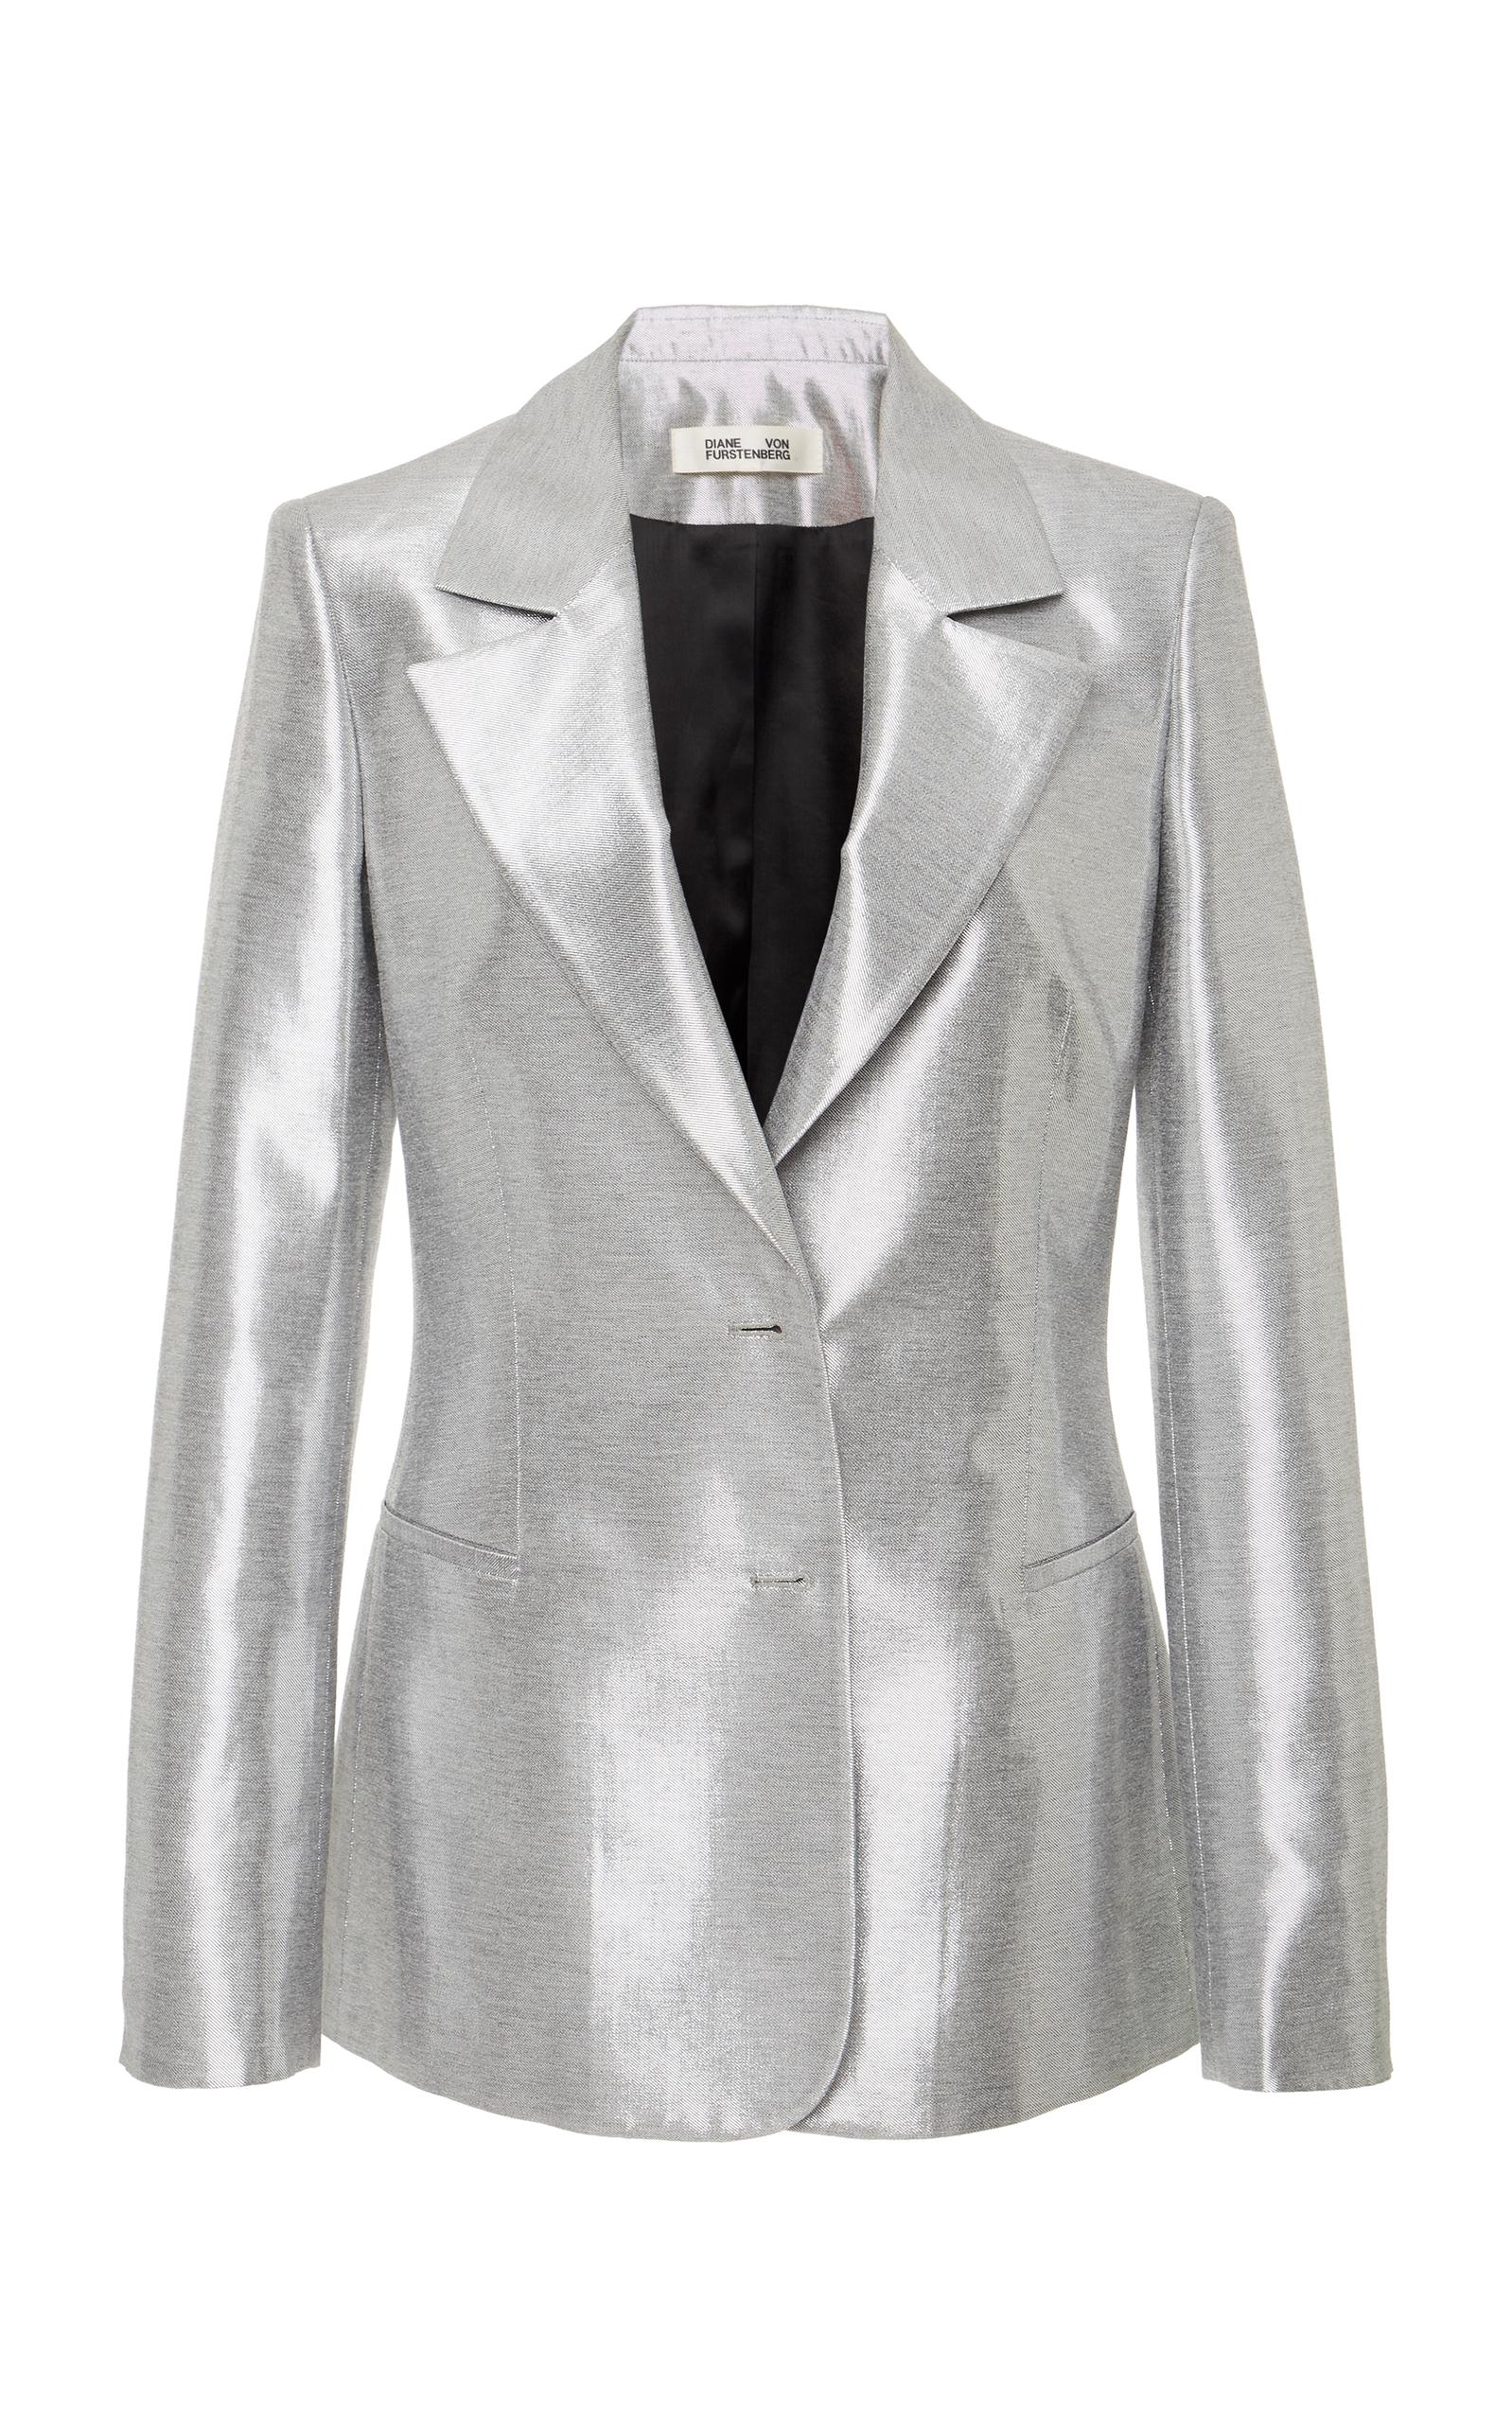 Classic Silver Metallic Blazer